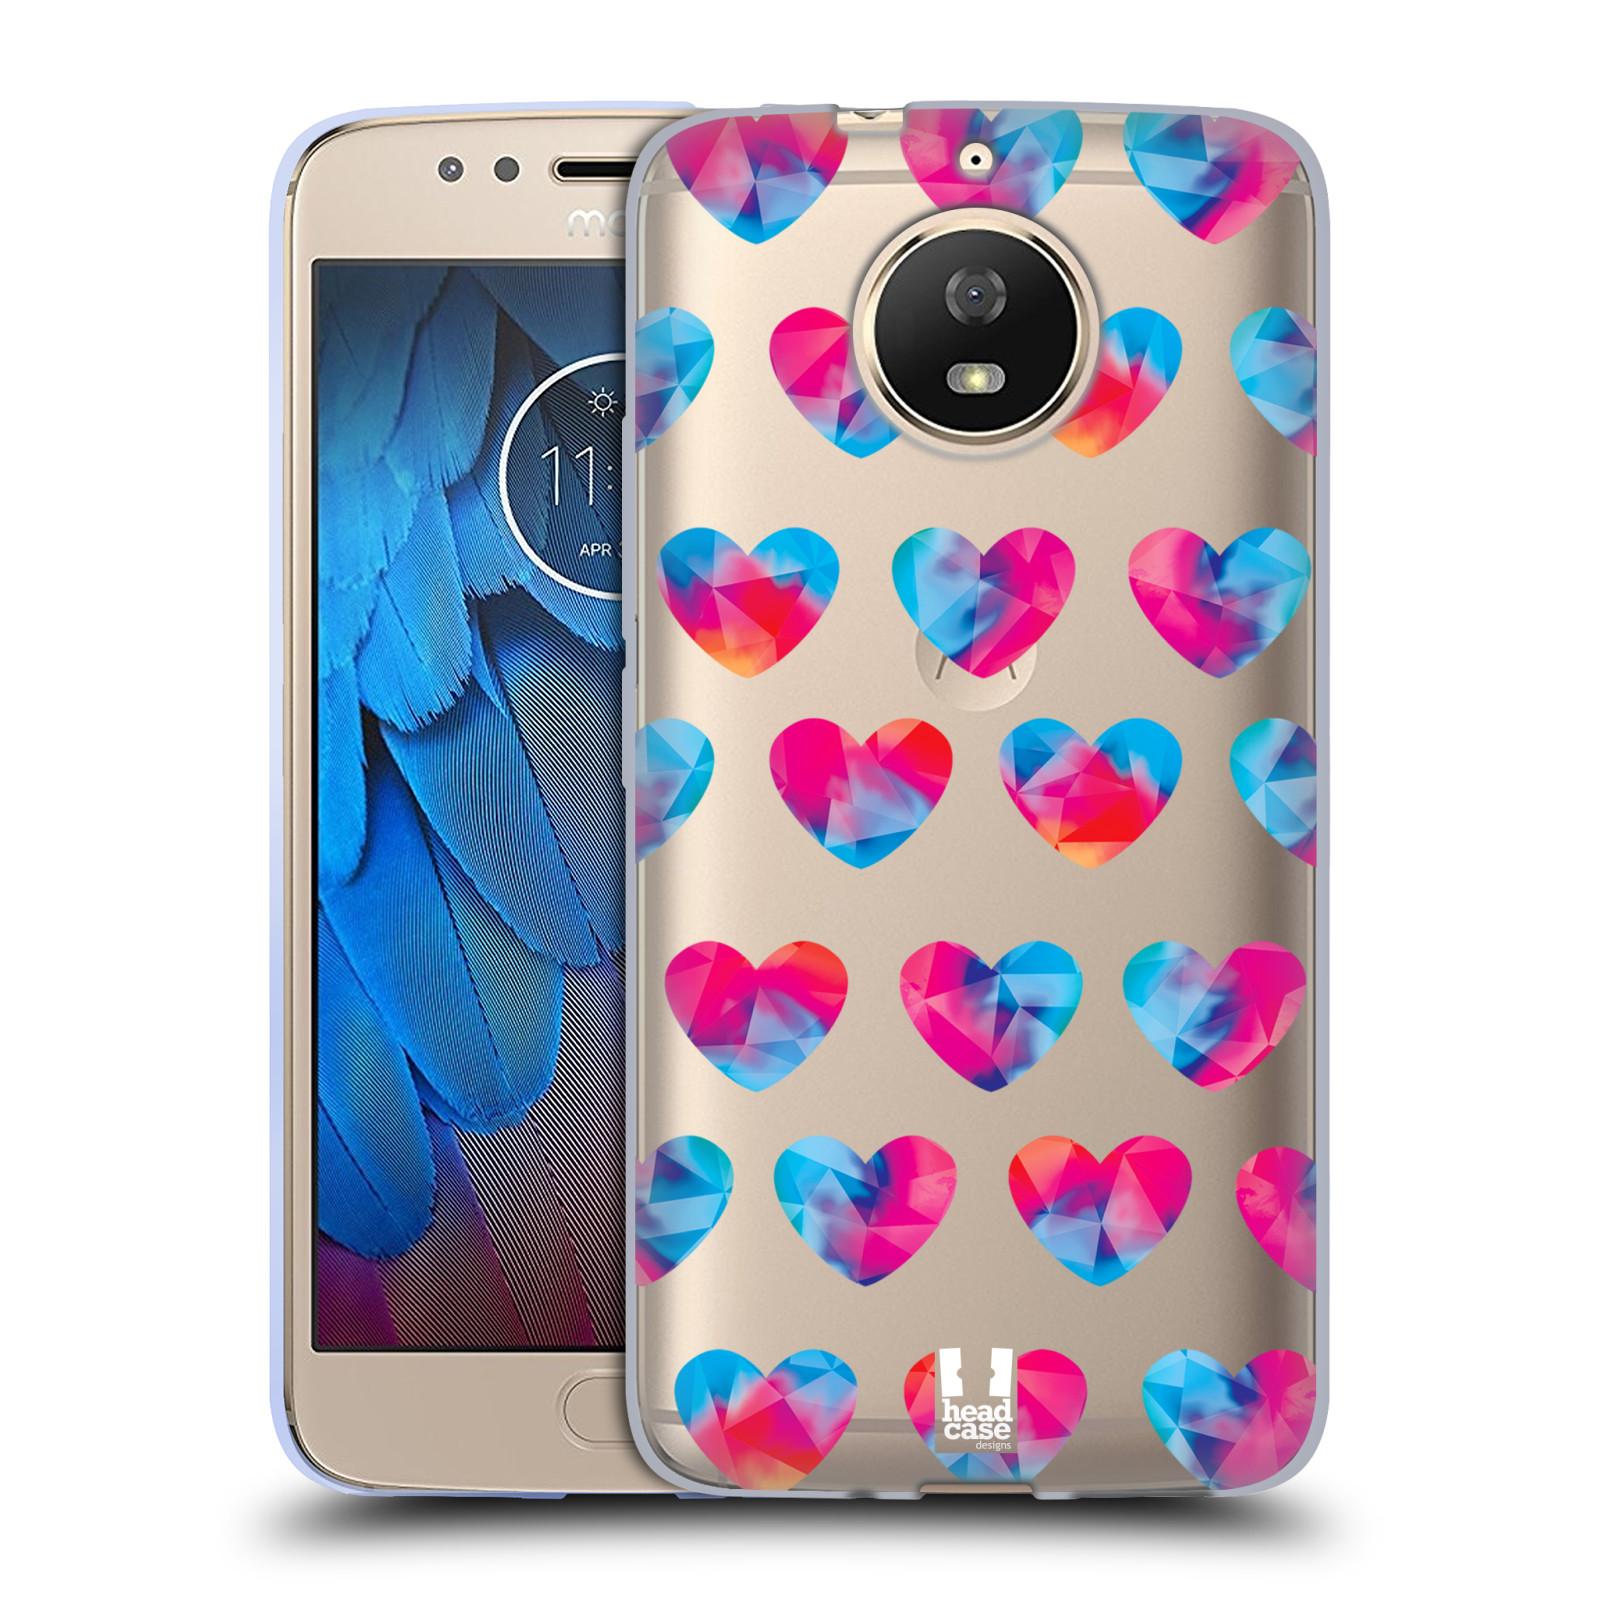 Silikonové pouzdro na mobil Lenovo Moto G5s - Head Case - Srdíčka hrající barvami